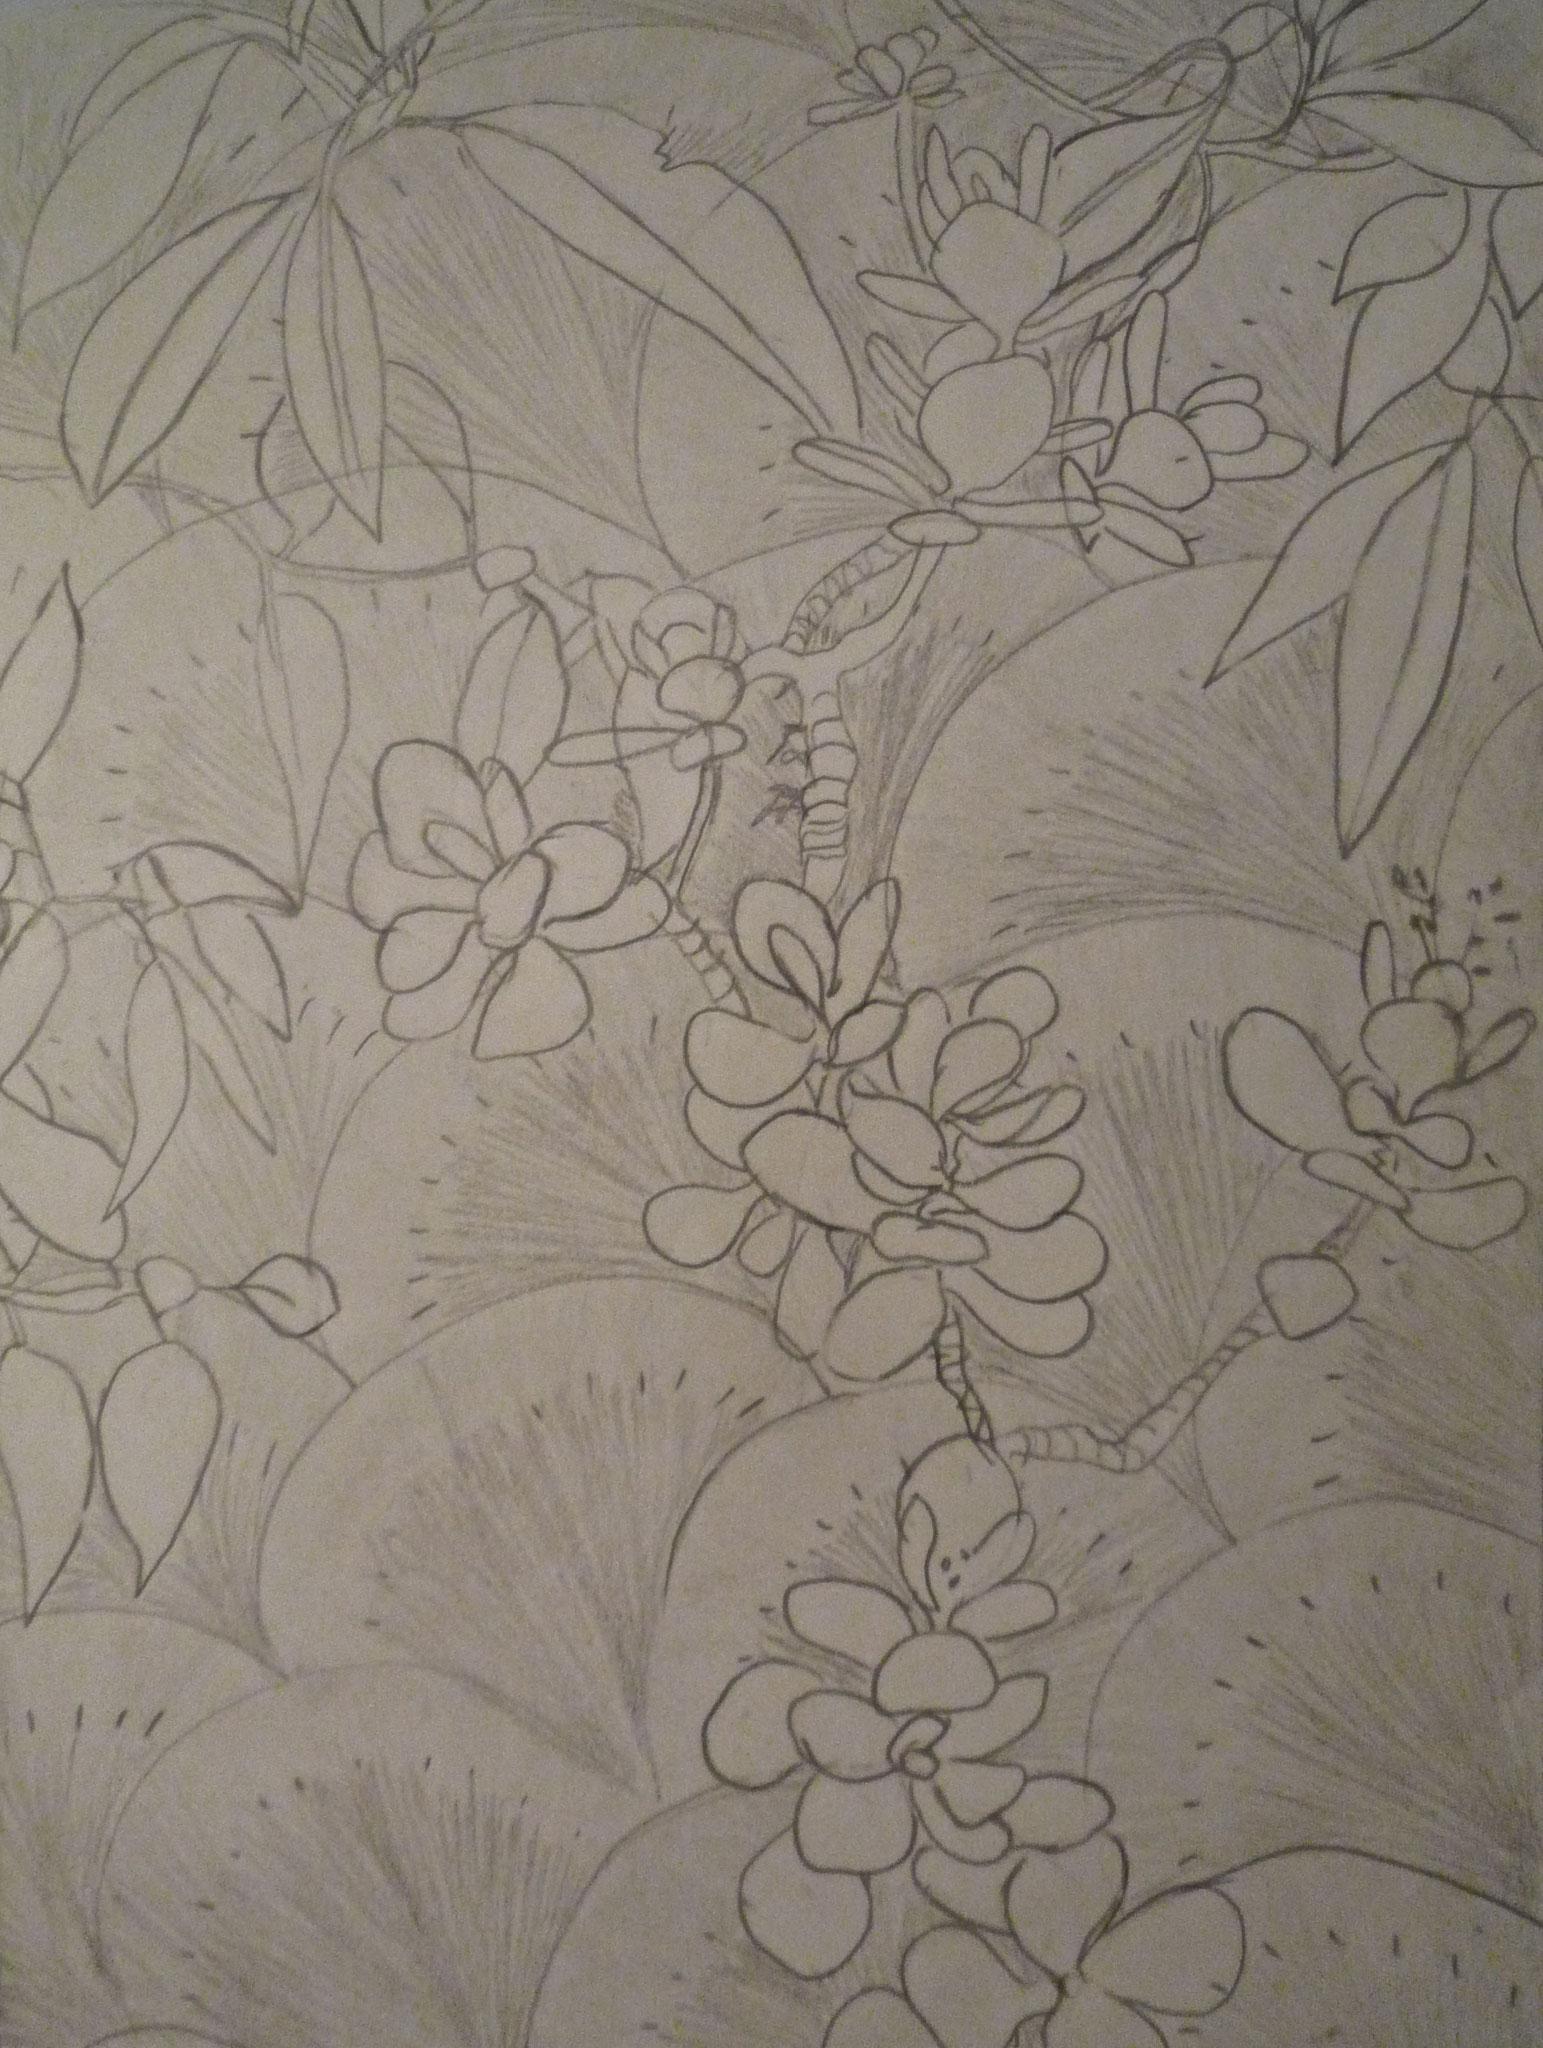 Croquis de plante chez Maud